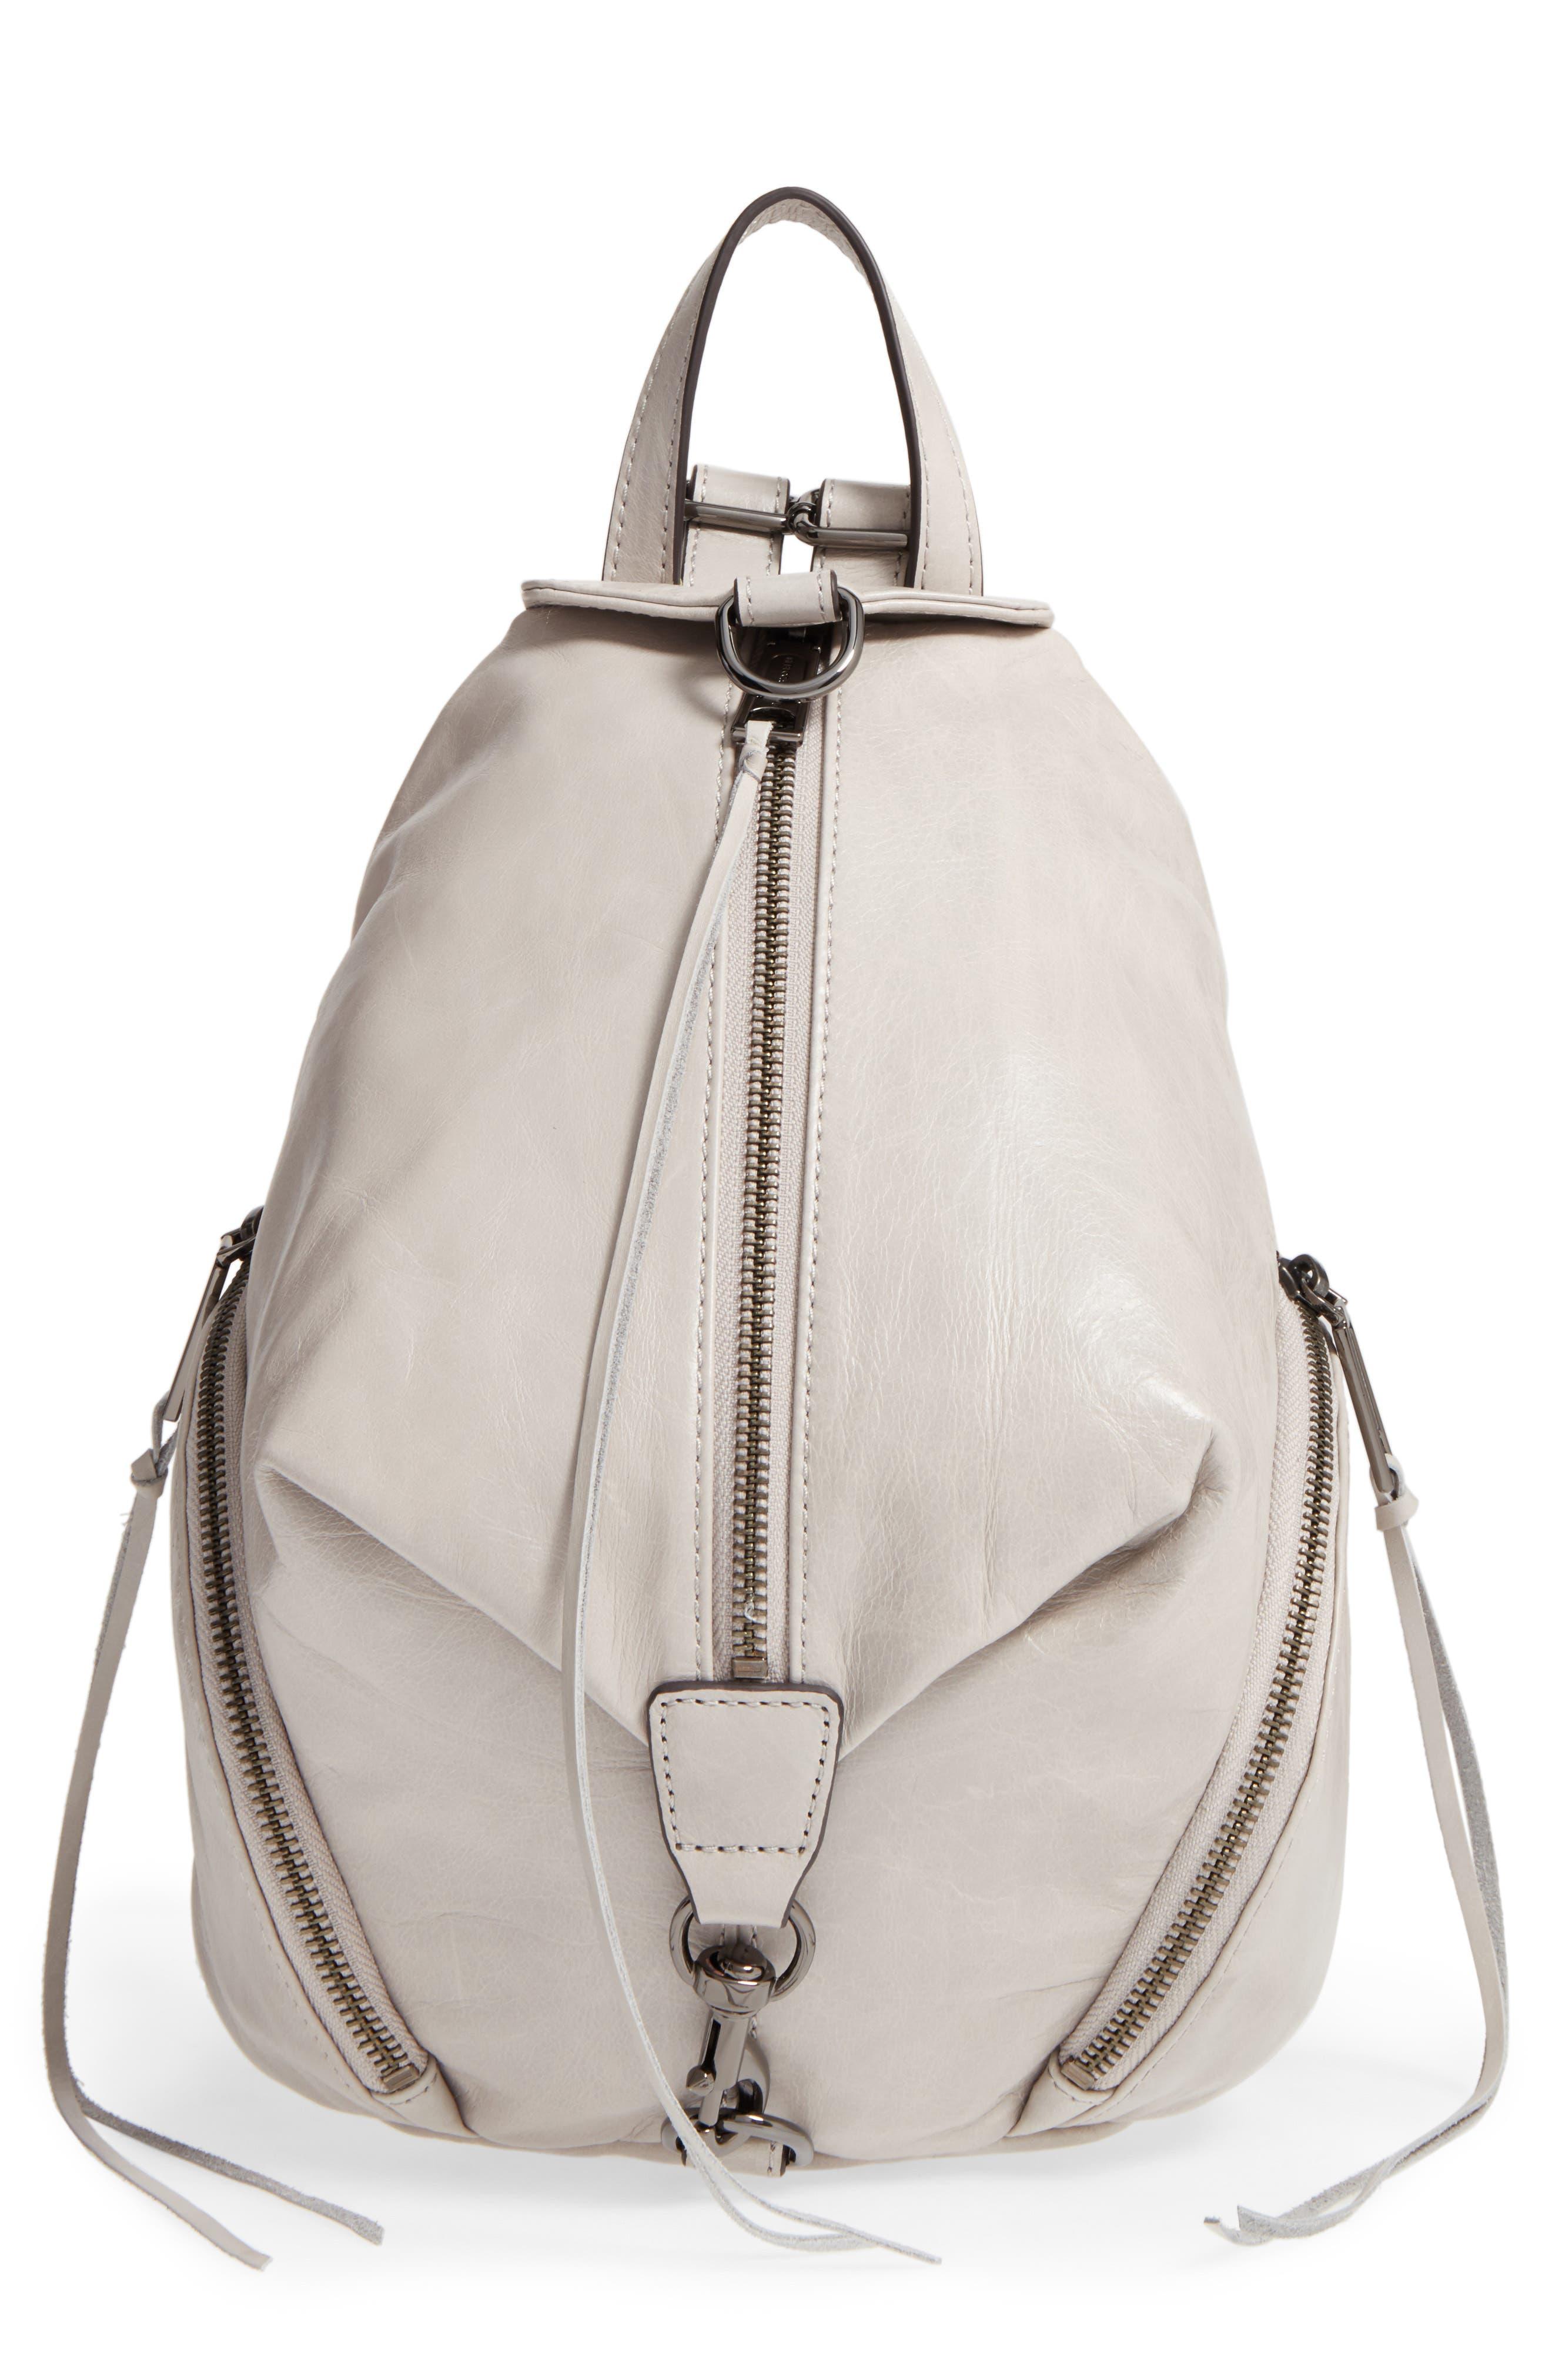 Medium Julian Leather Backpack,                         Main,                         color, Putty/ Gunmetal